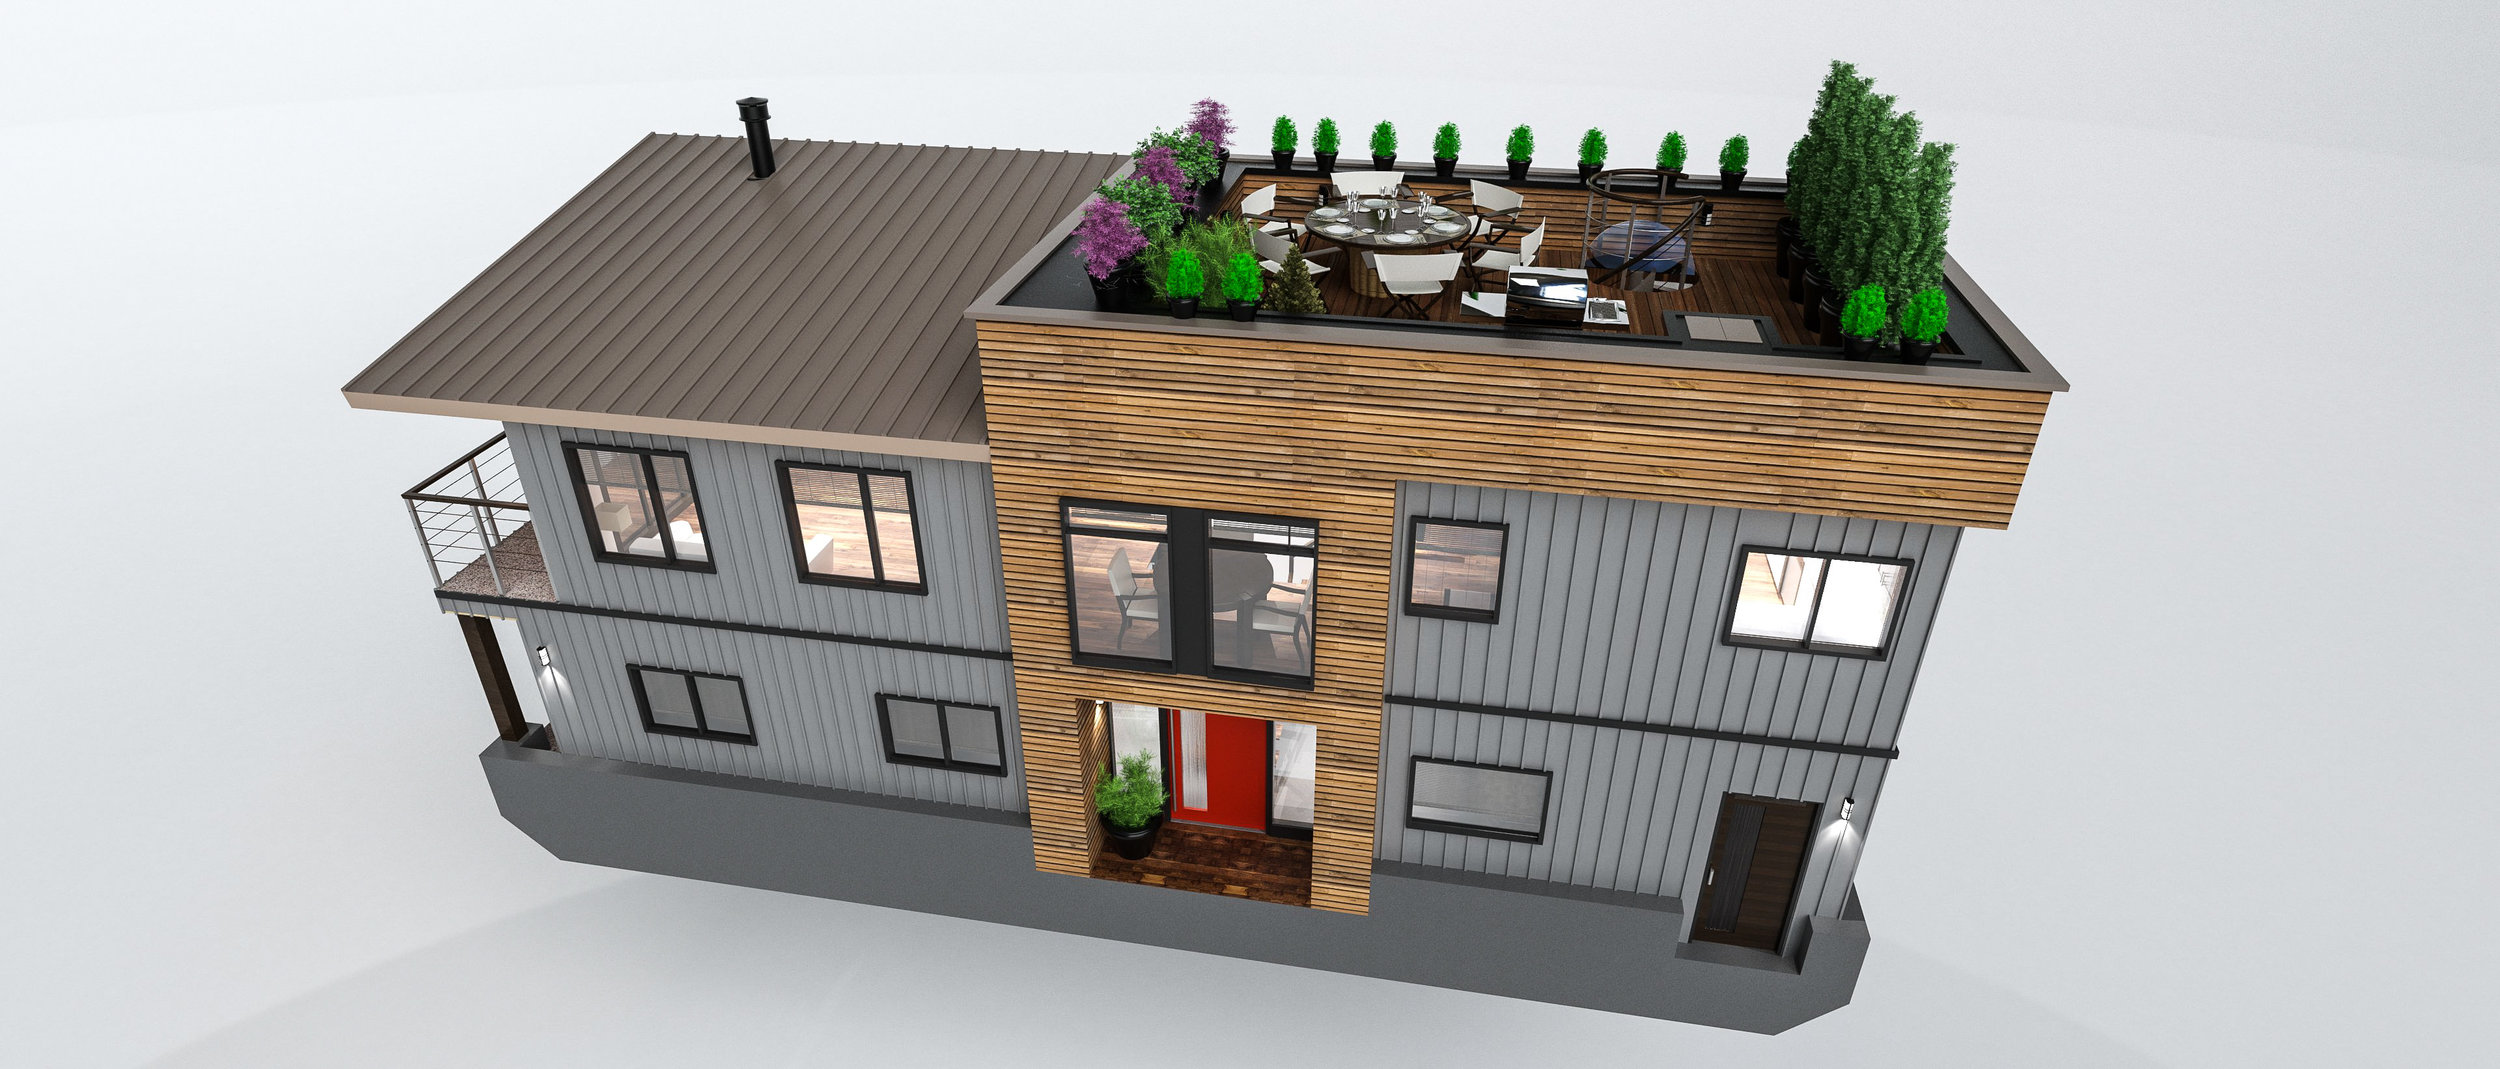 exterior 01 studio.jpg